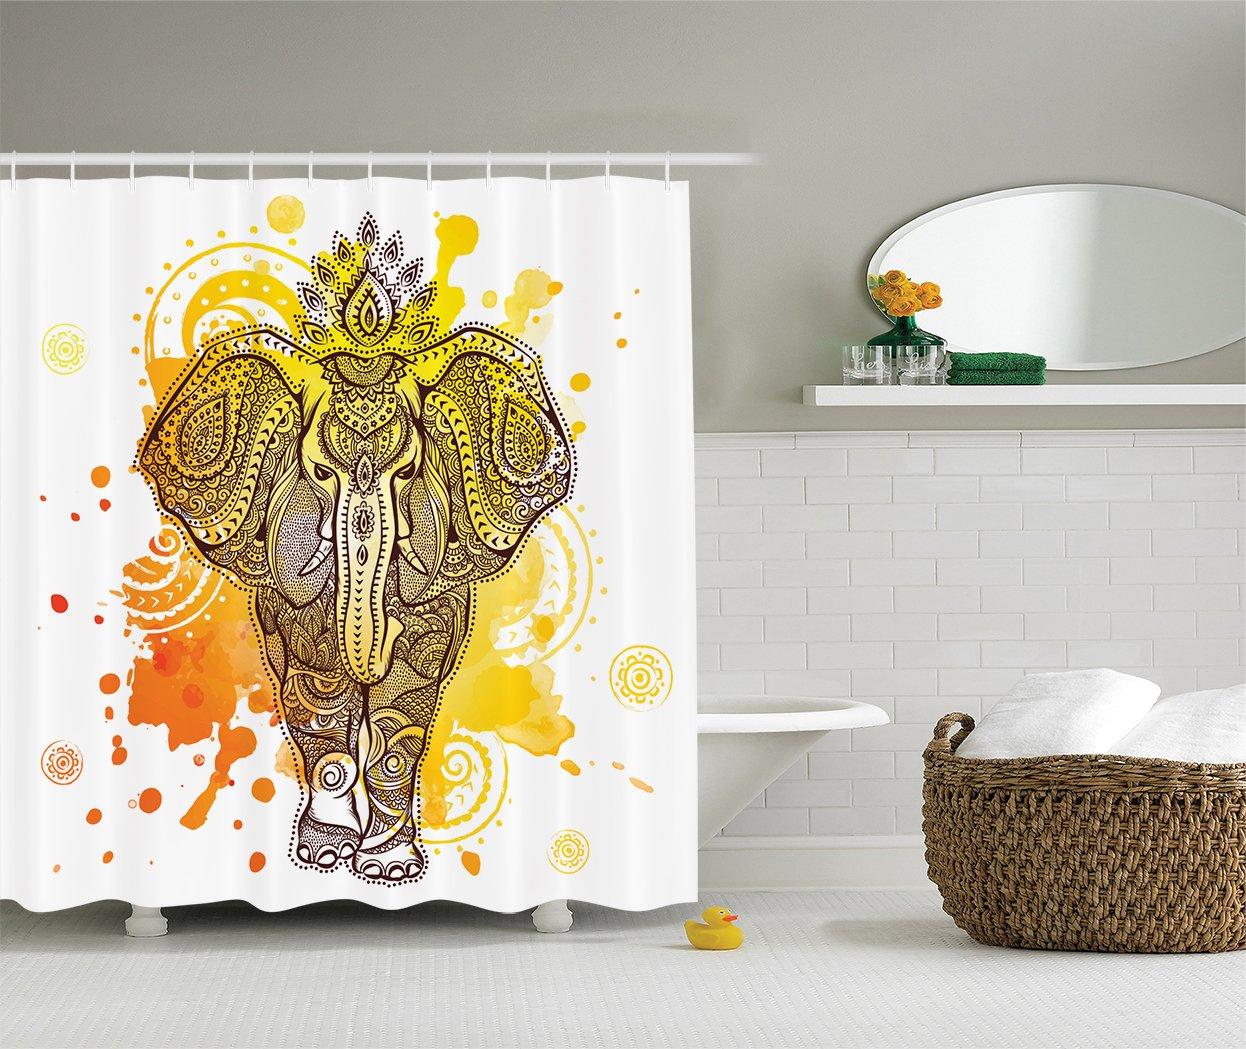 Amazon.com: Ambesonne Watercolor Splash Art Decor Shower Curtain Set ...